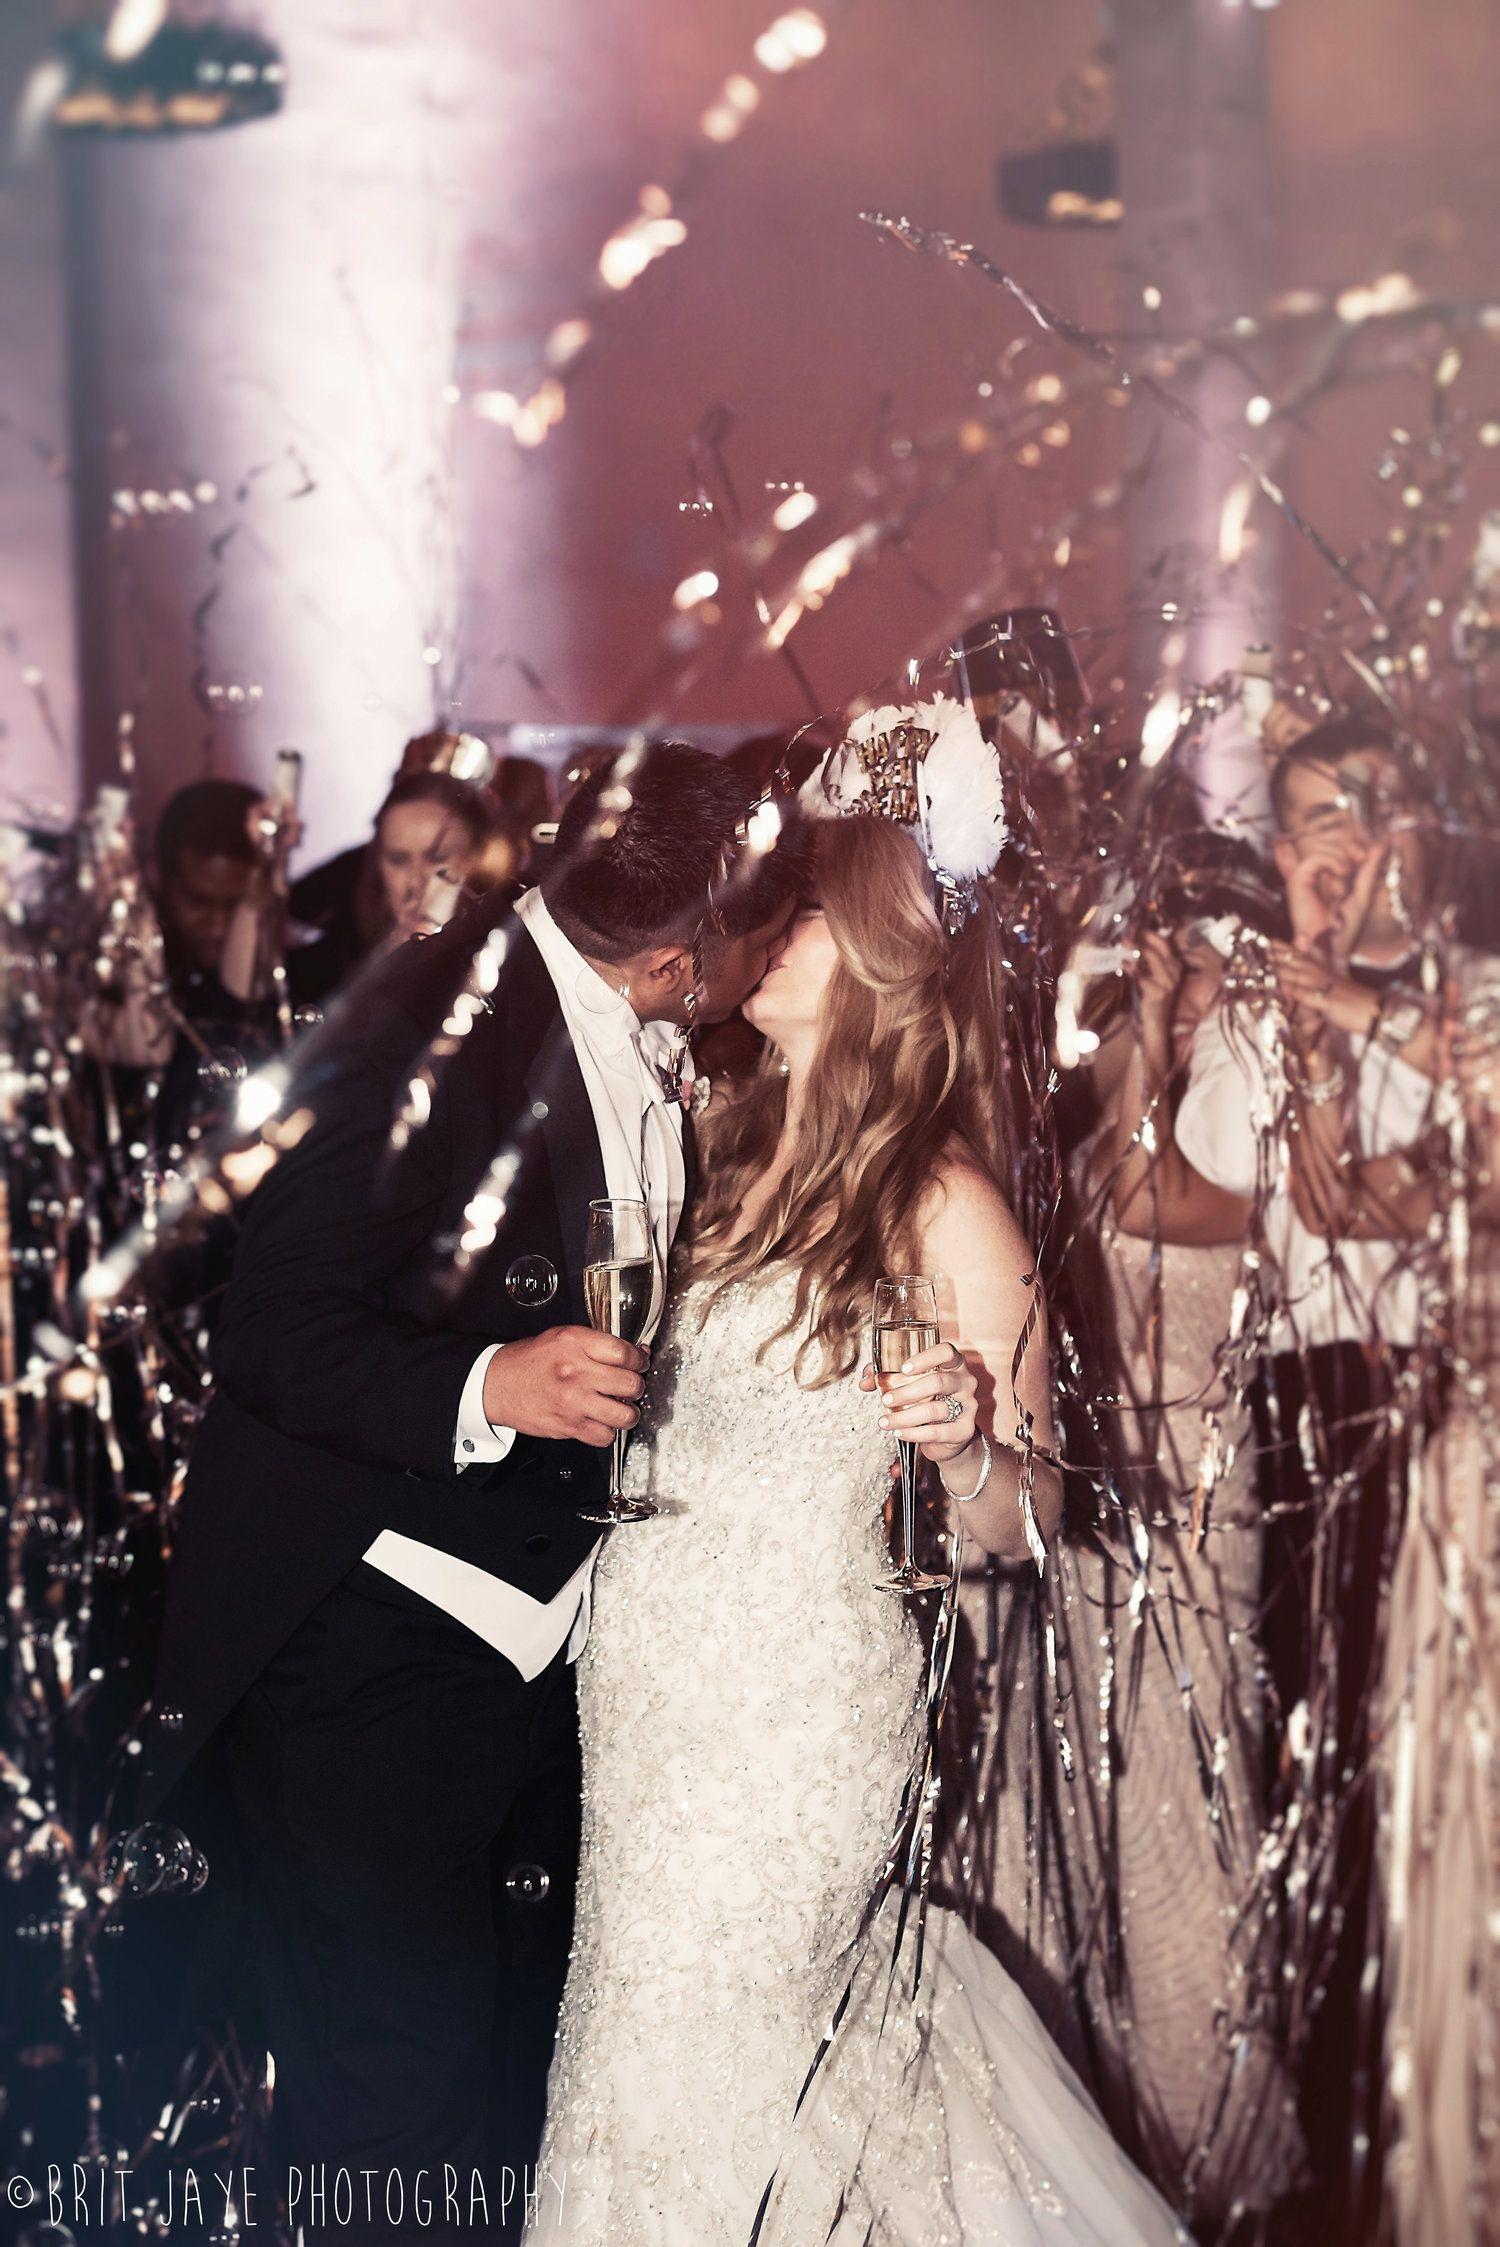 New Years Eve Wedding: Sneak Peek! — San Diego Wedding Photography